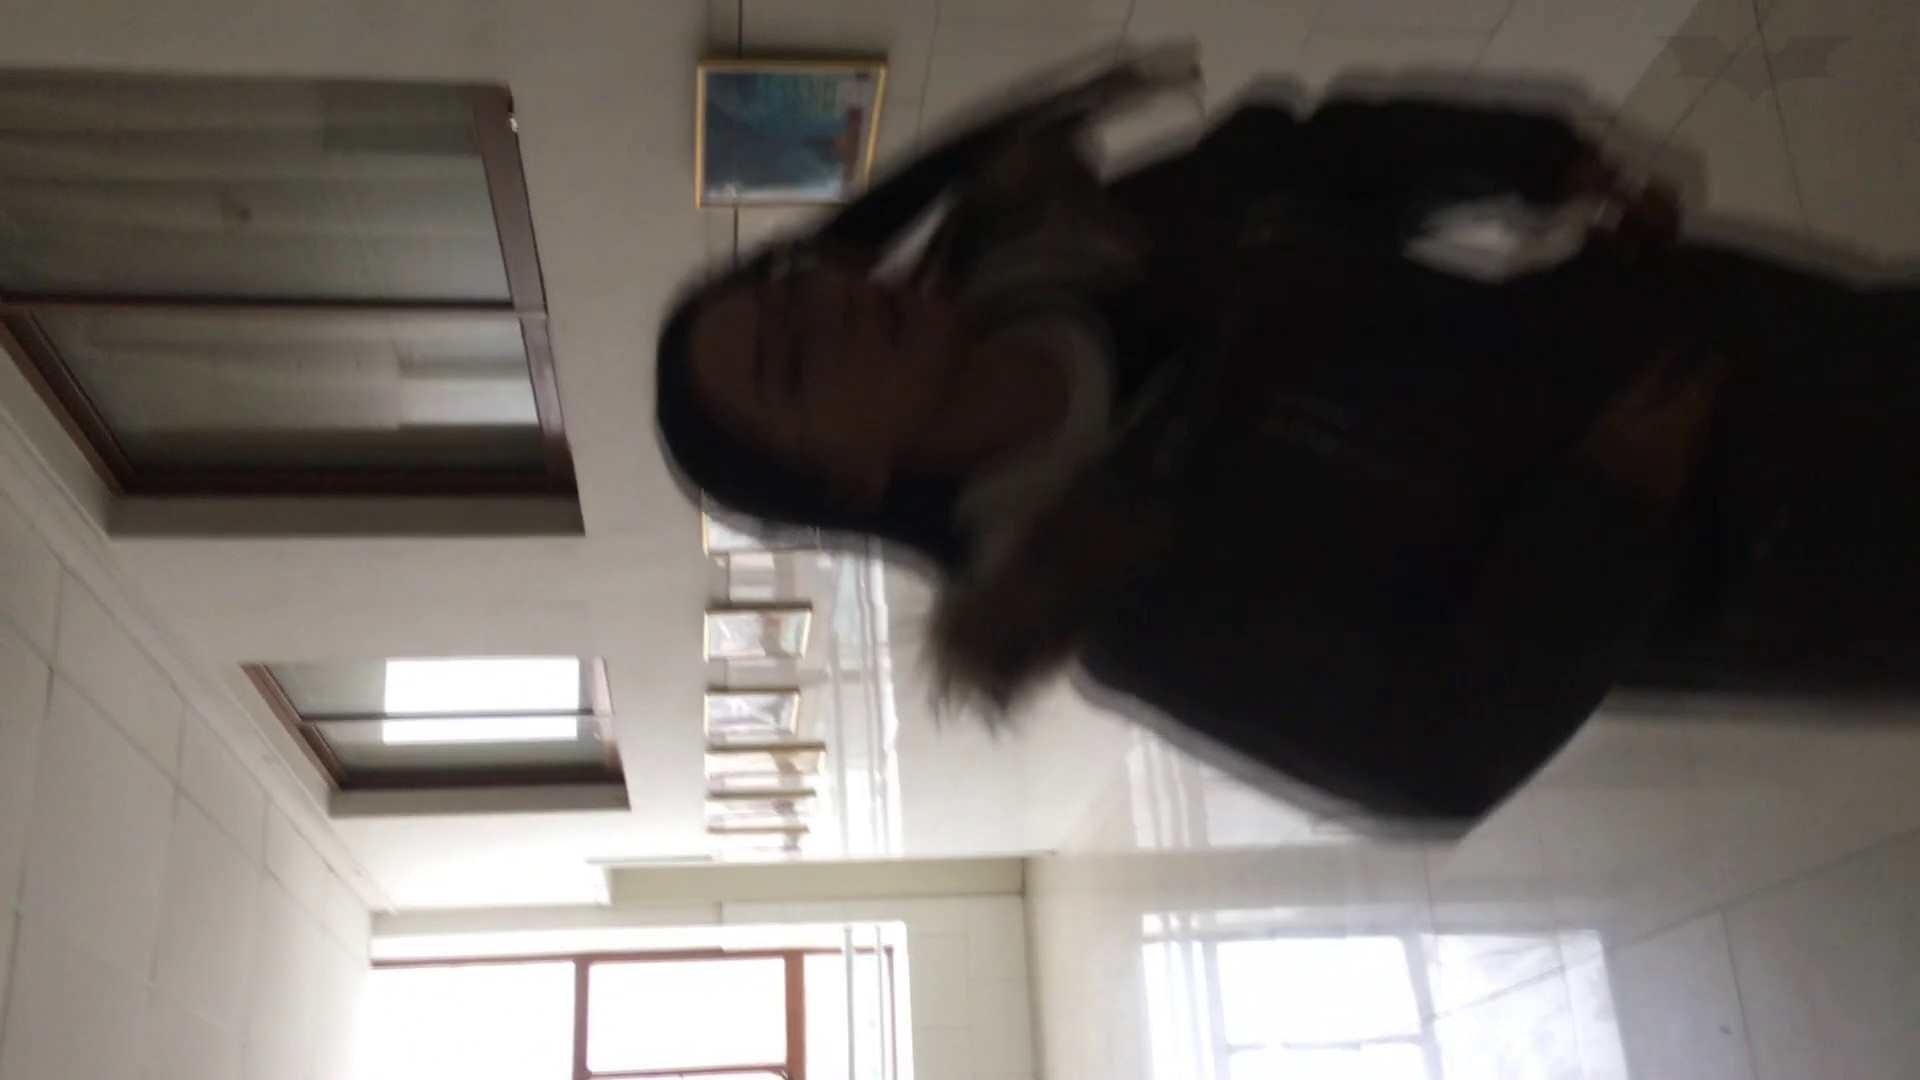 芸術大学ガチ潜入盗撮 JD盗撮 美女の洗面所の秘密 Vol.89 洗面所着替え | 潜入エロ調査  77連発 61